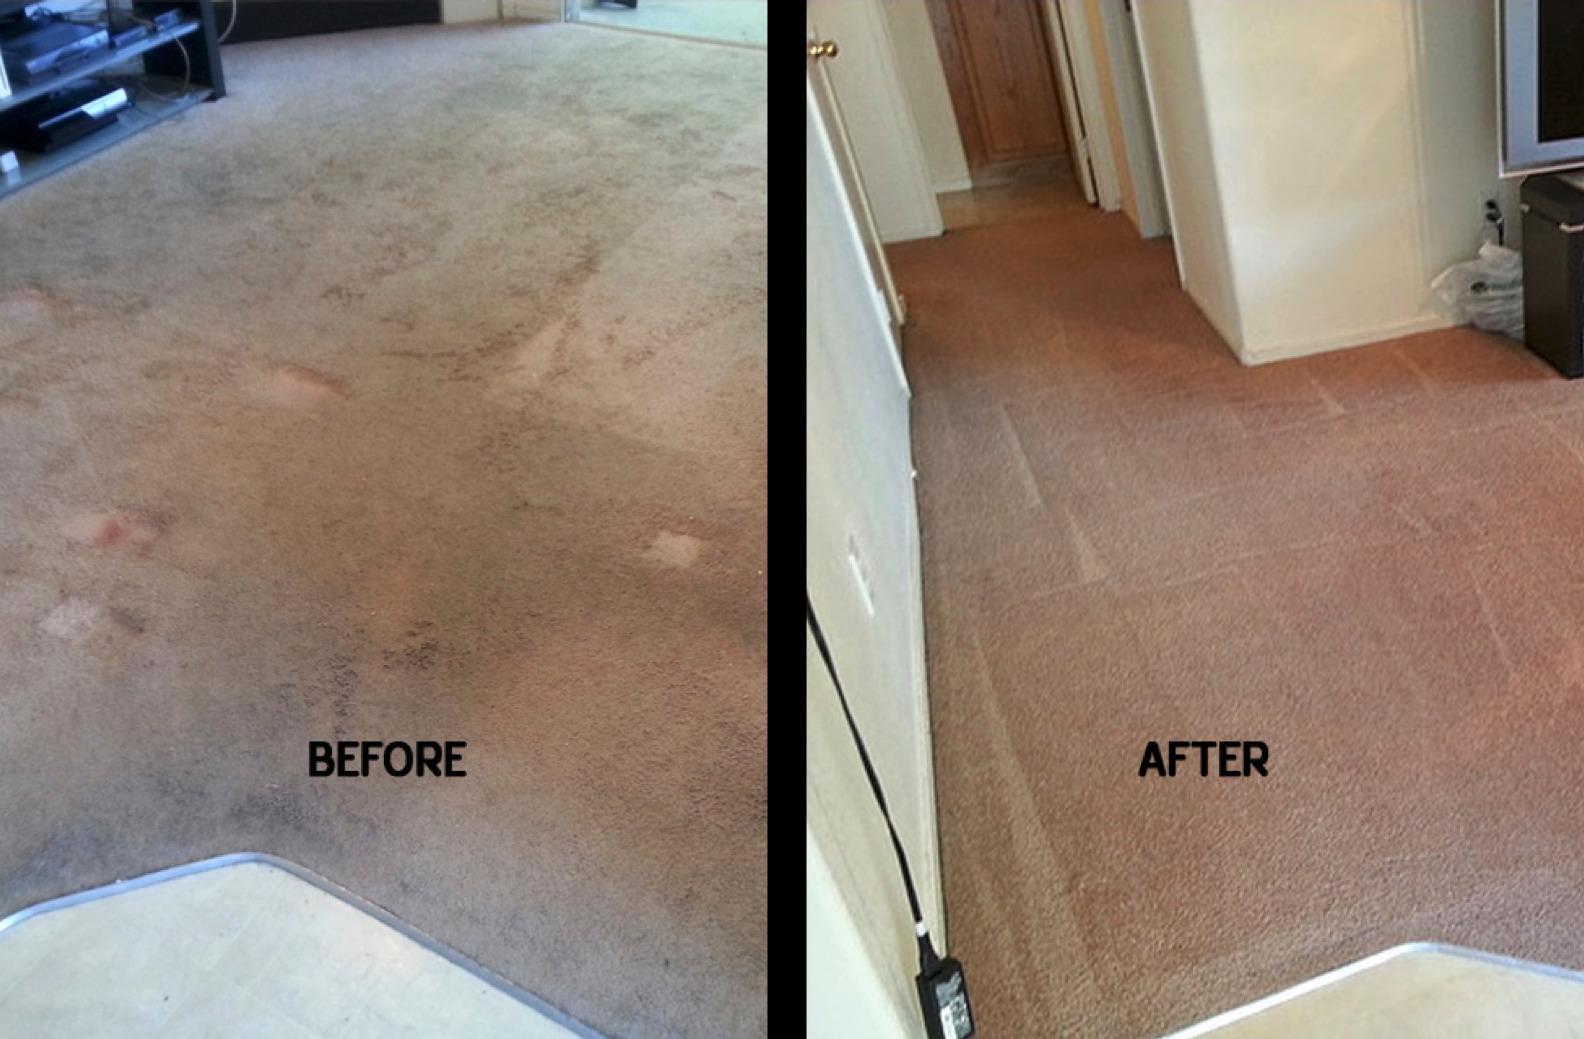 aaa carpet cleaning in las vegas